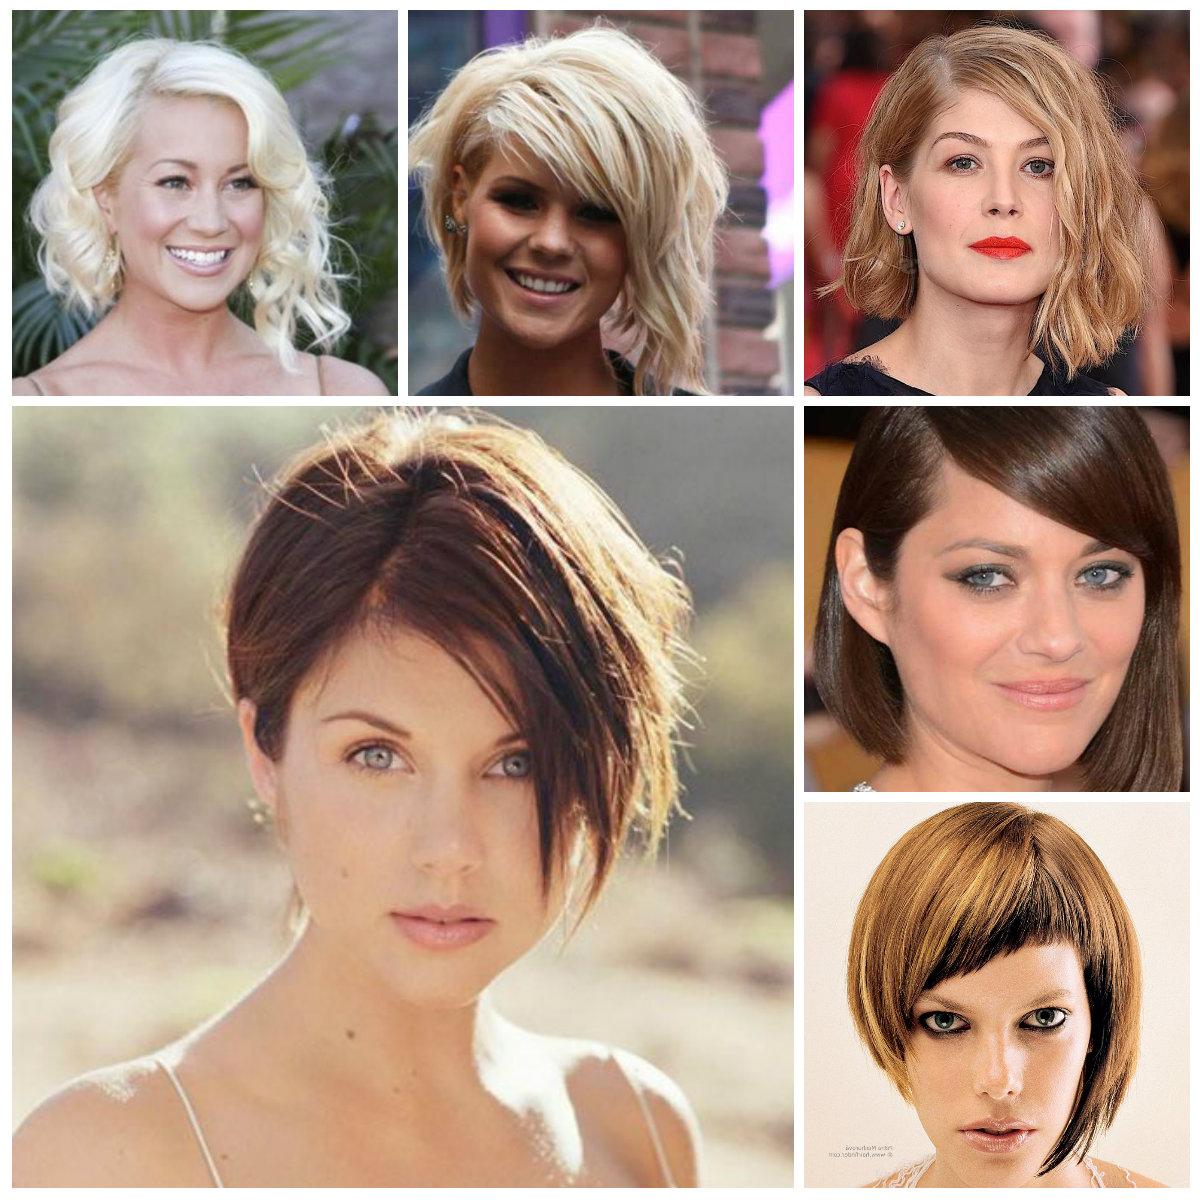 Edgy Asymmetrical Bob Haircuts For 2016   2019 Haircuts, Hairstyles Pertaining To Edgy Short Bob Haircuts (View 17 of 25)